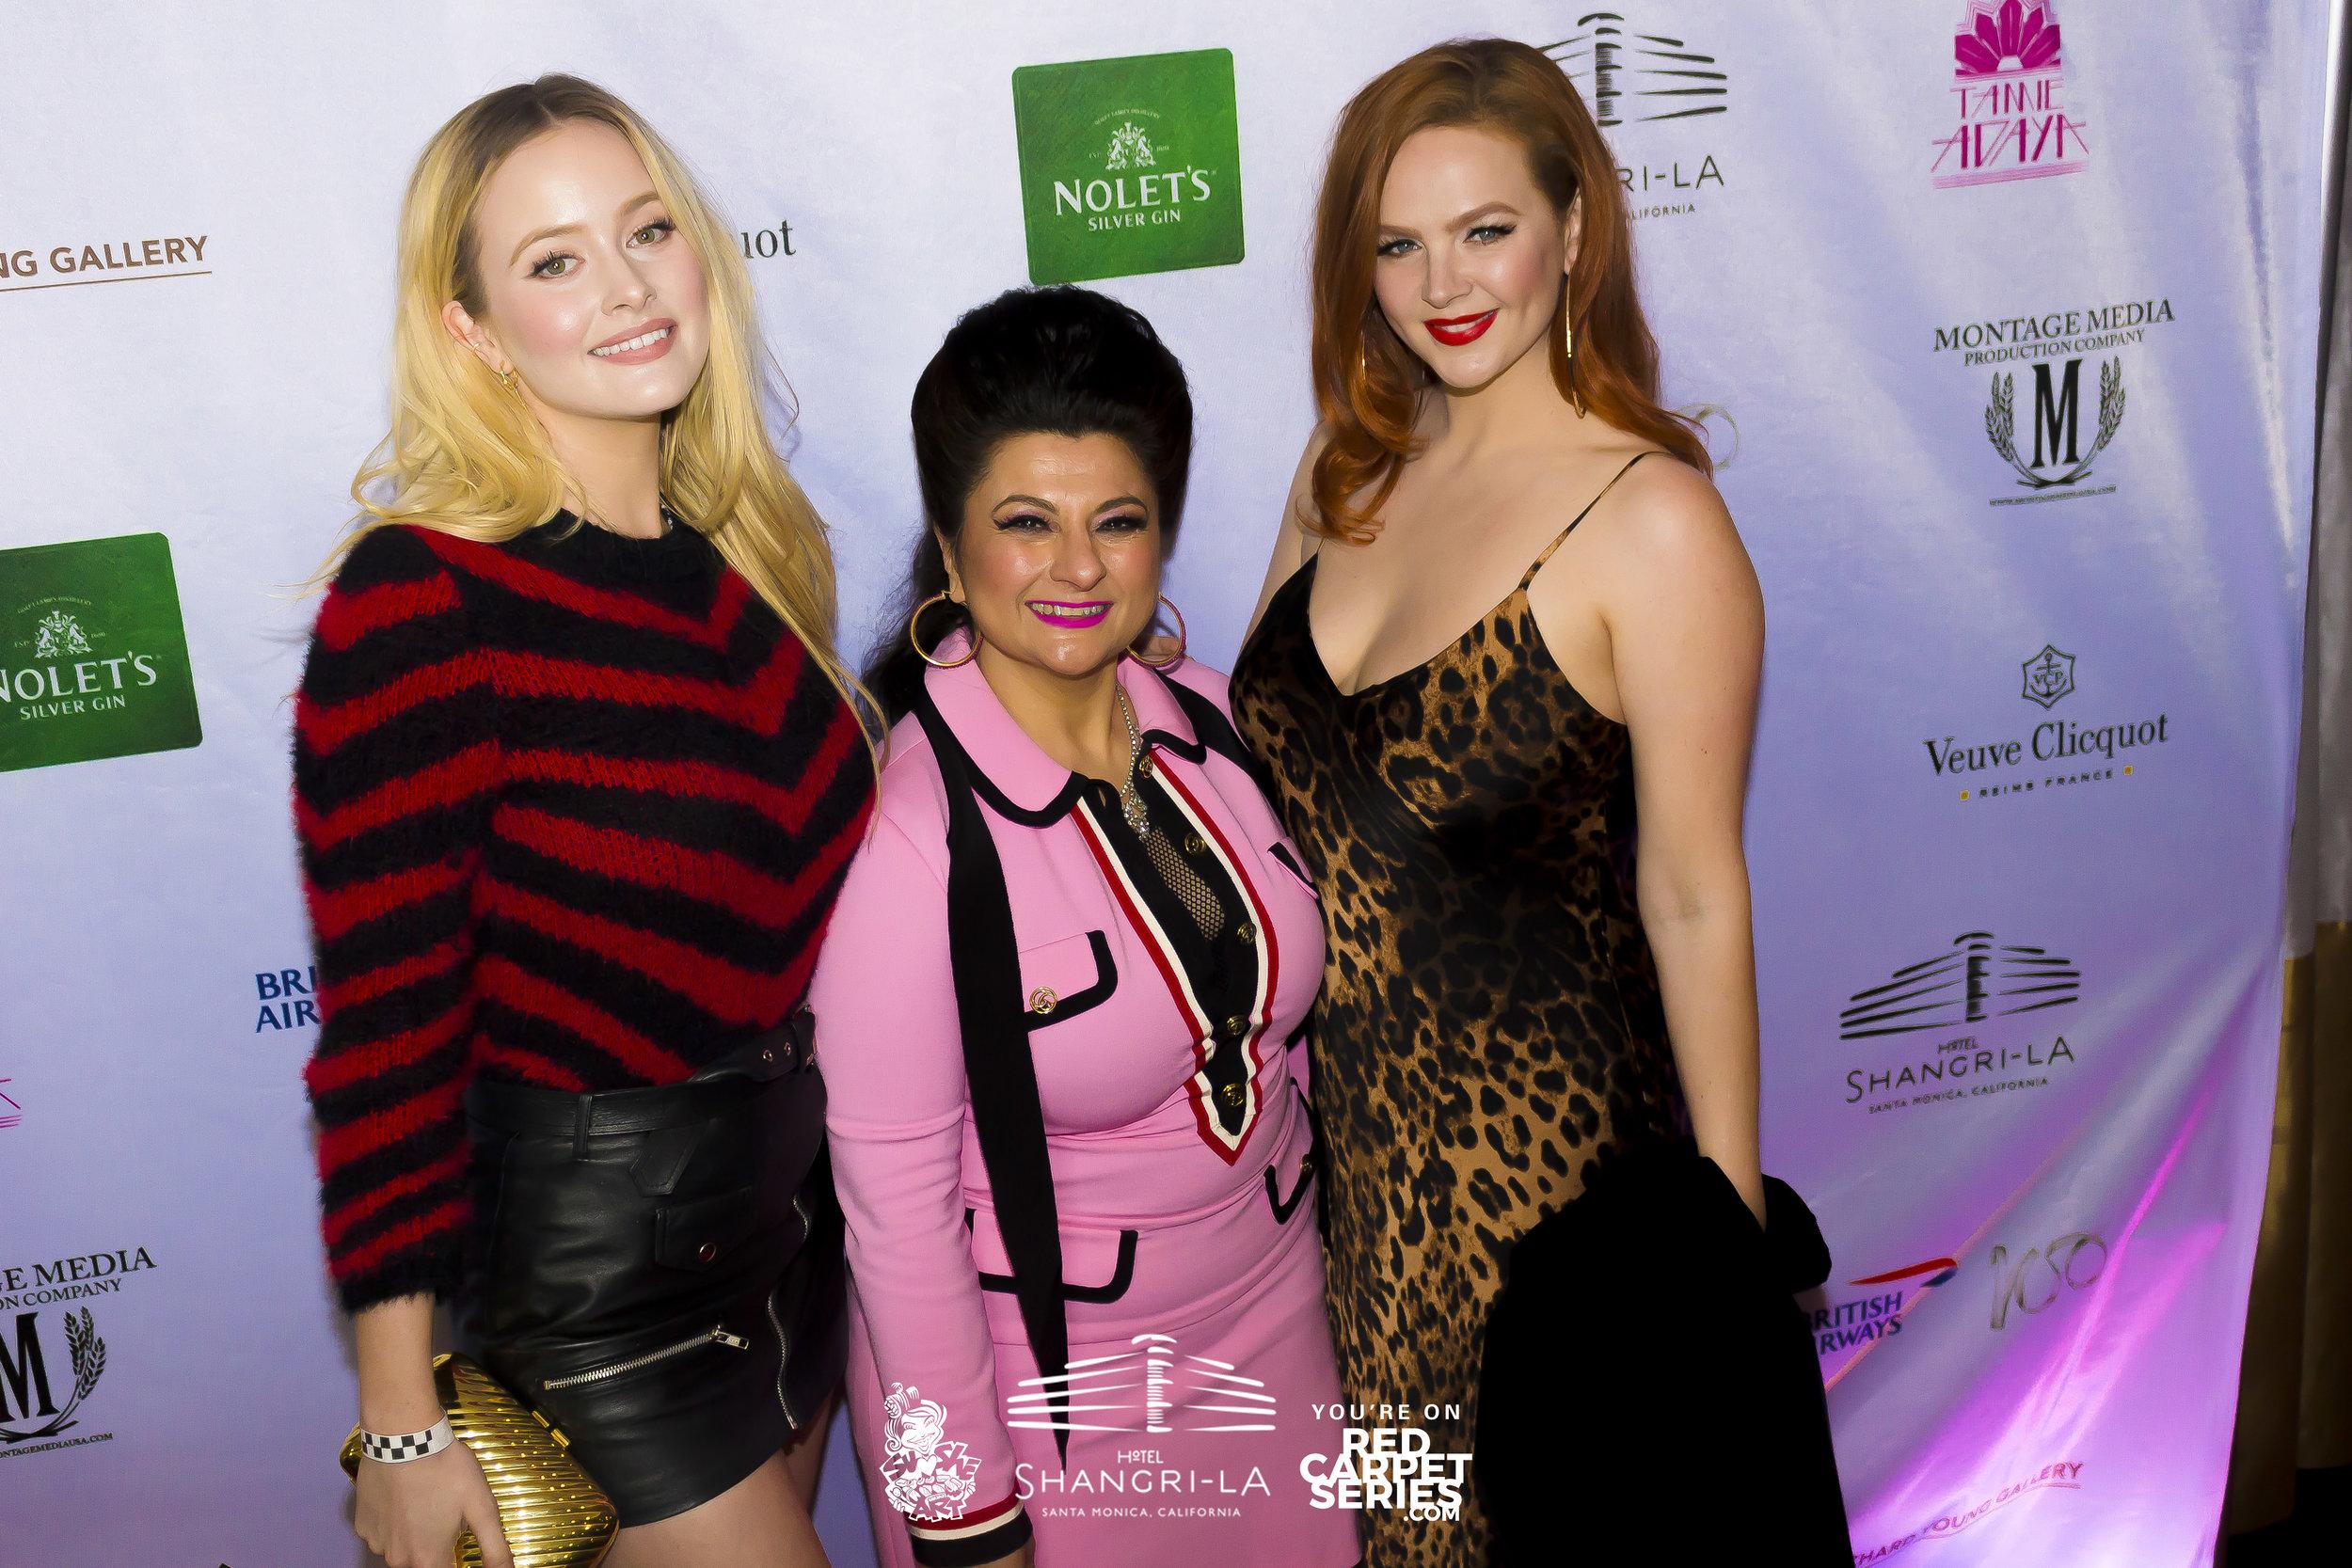 Shangri-la Diamond Jubilee - 03-11-19_76.jpg